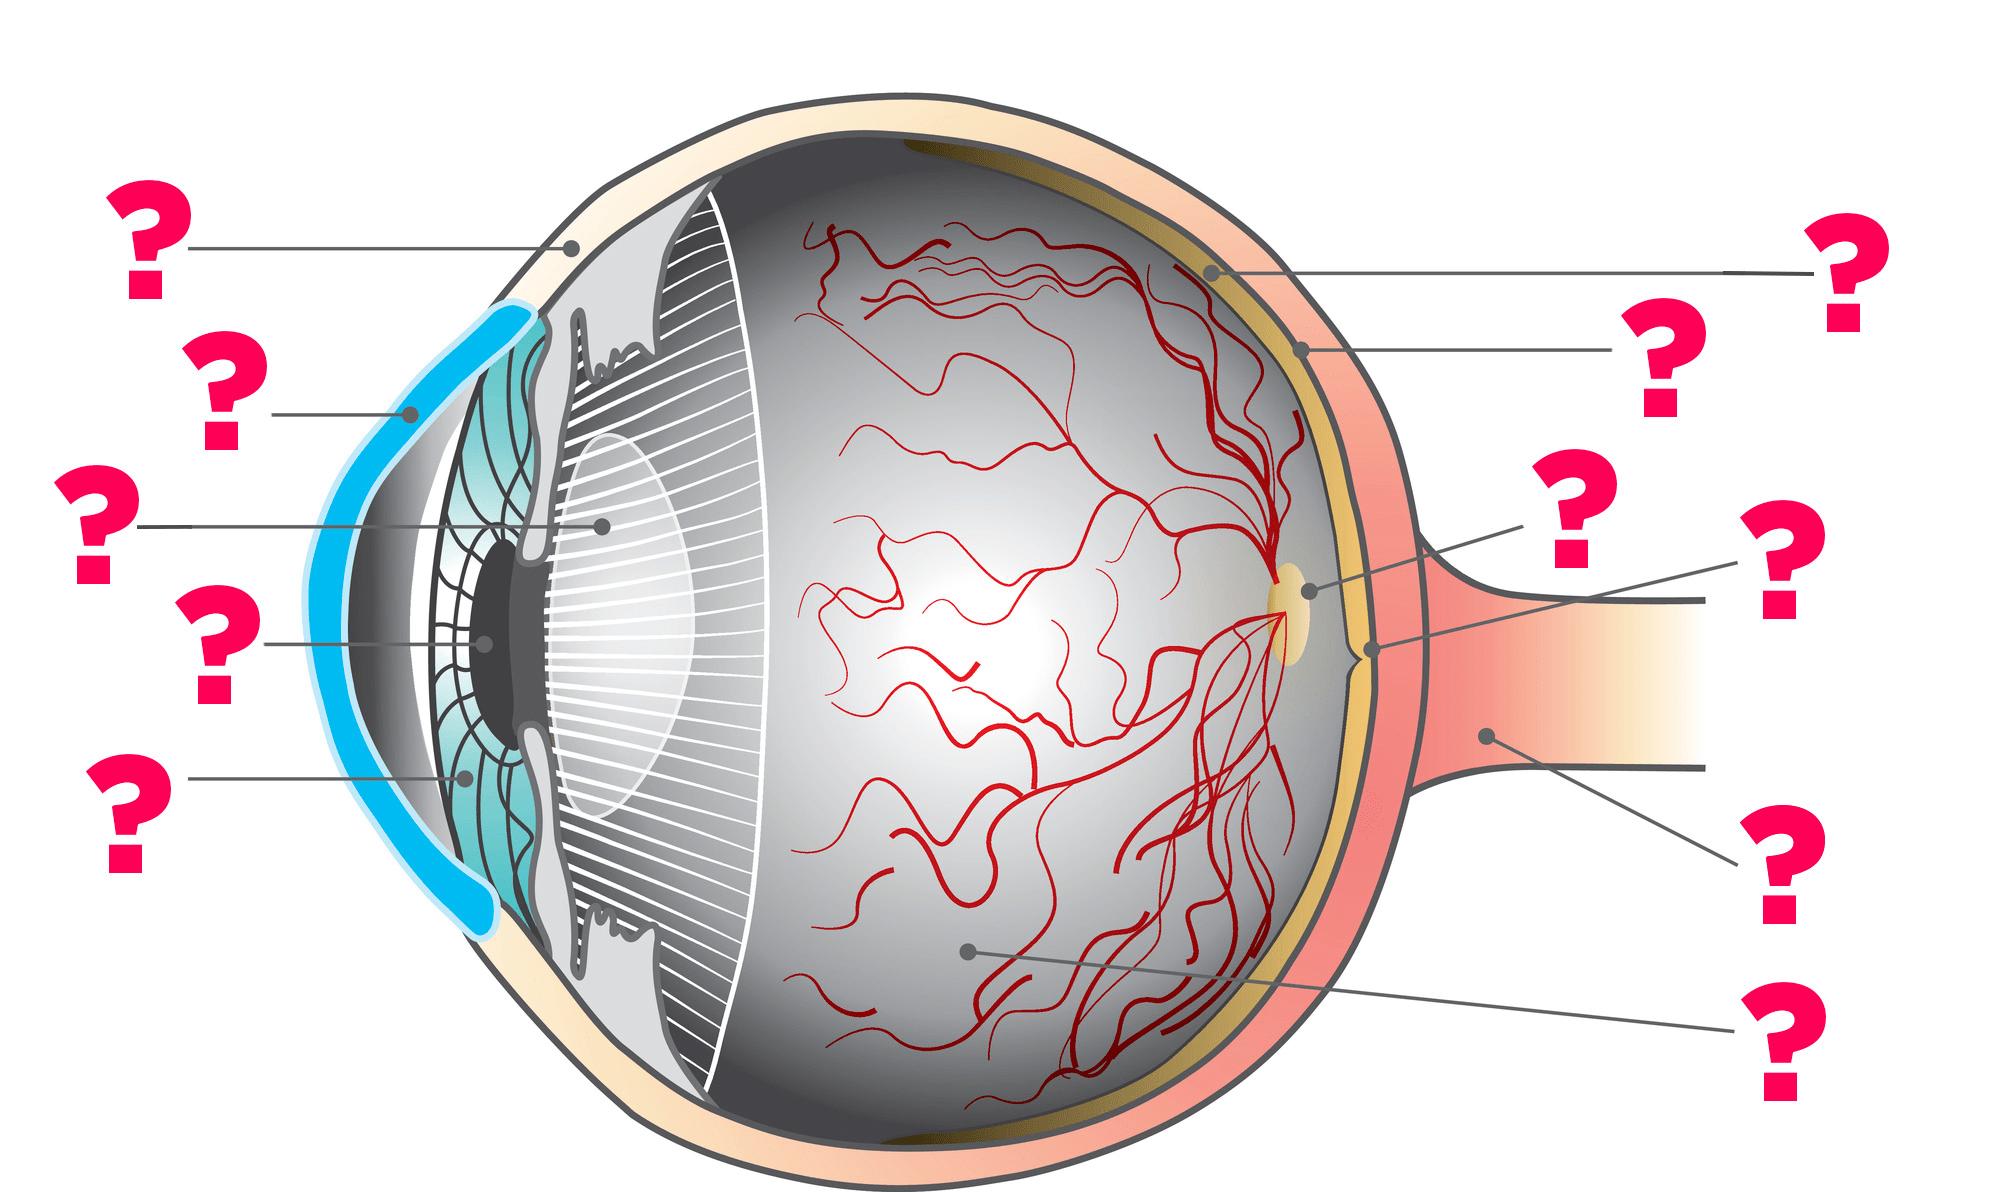 eye diagram for quiz wiring diagram read eye diagram quiz game [ 1993 x 1192 Pixel ]